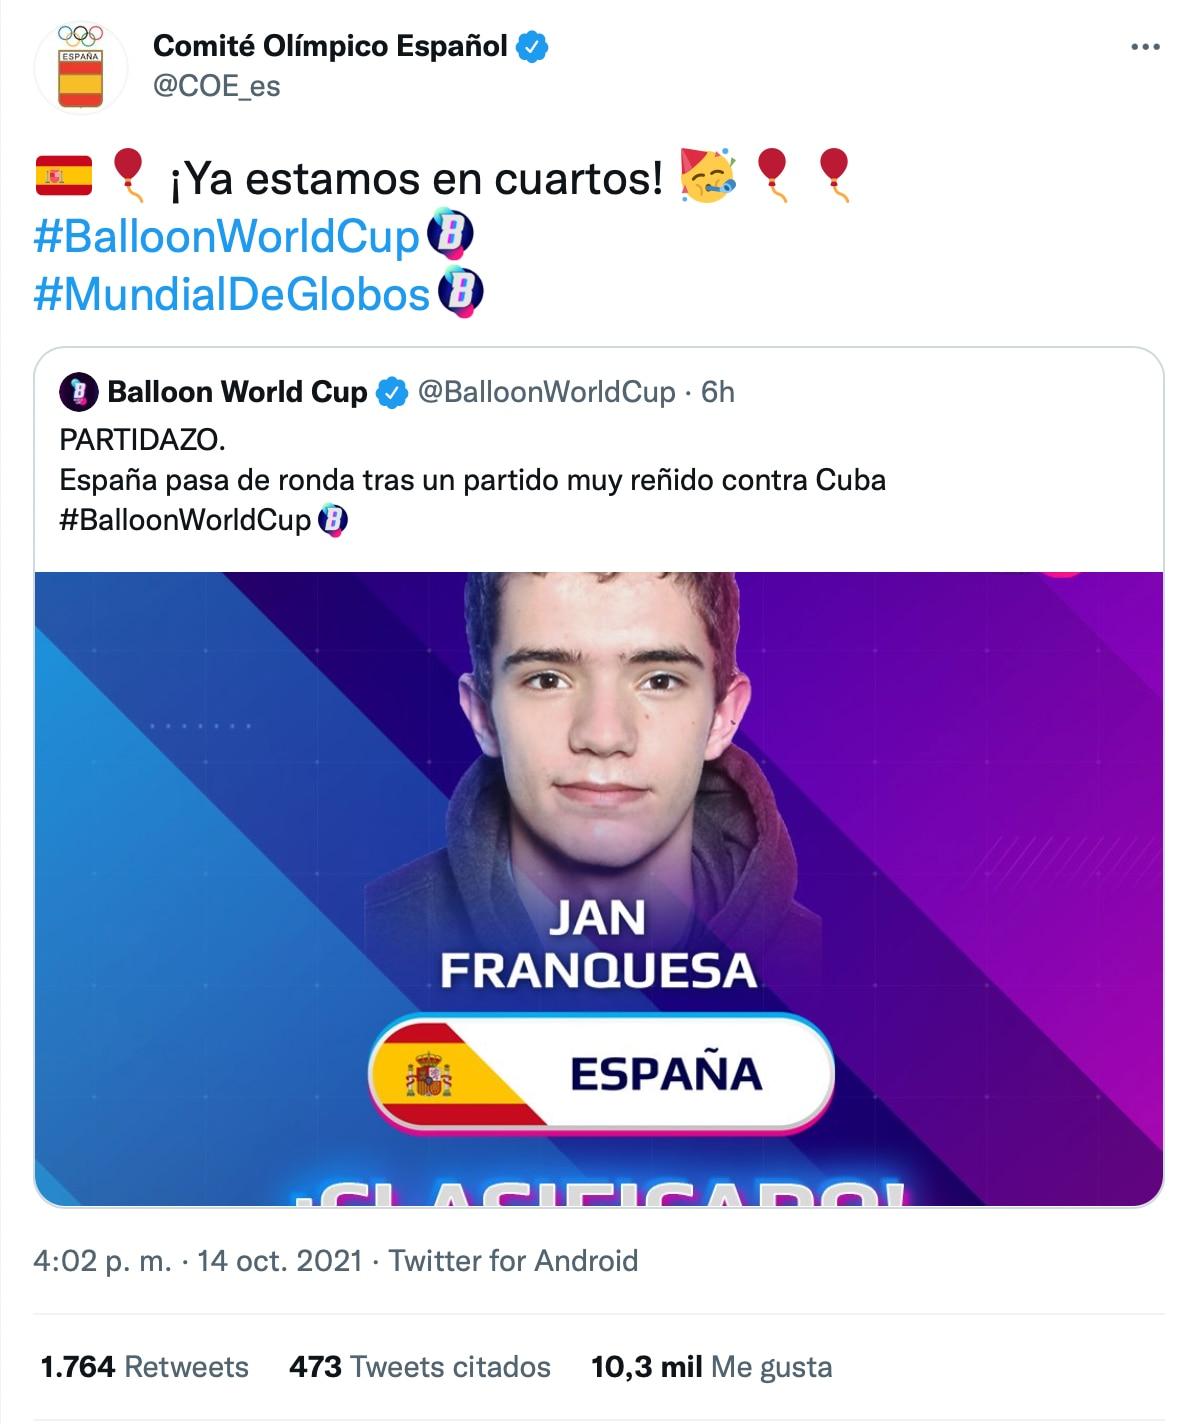 Comité Olímpico Español. (twitter: COE_es)